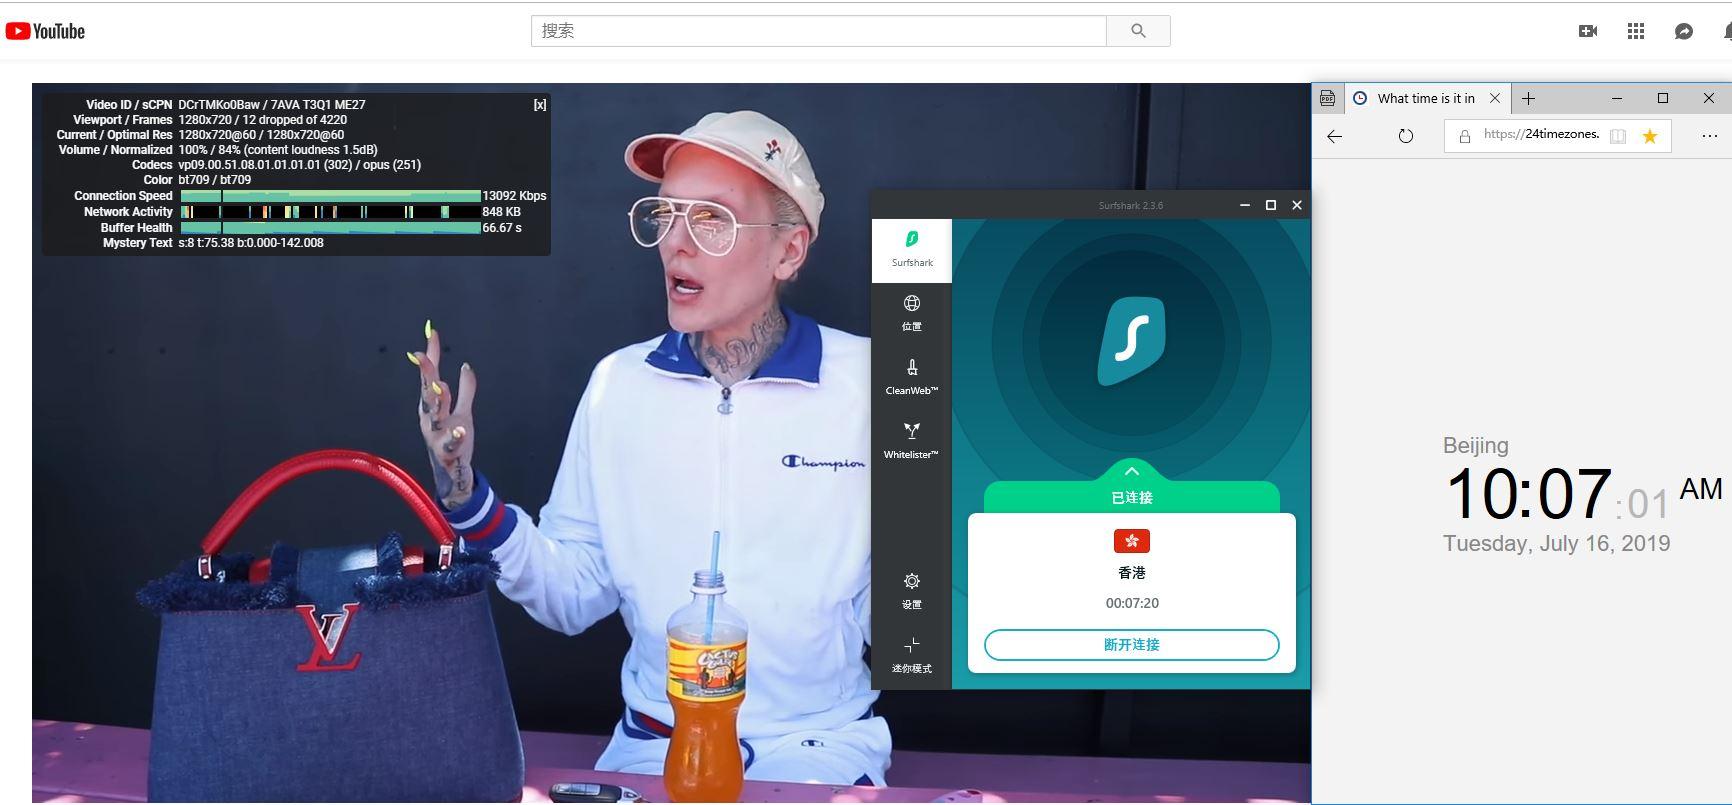 windows surfsharkVPN 香港 服务器节点 中国翻墙-科学上网 YouTube测试-20190716